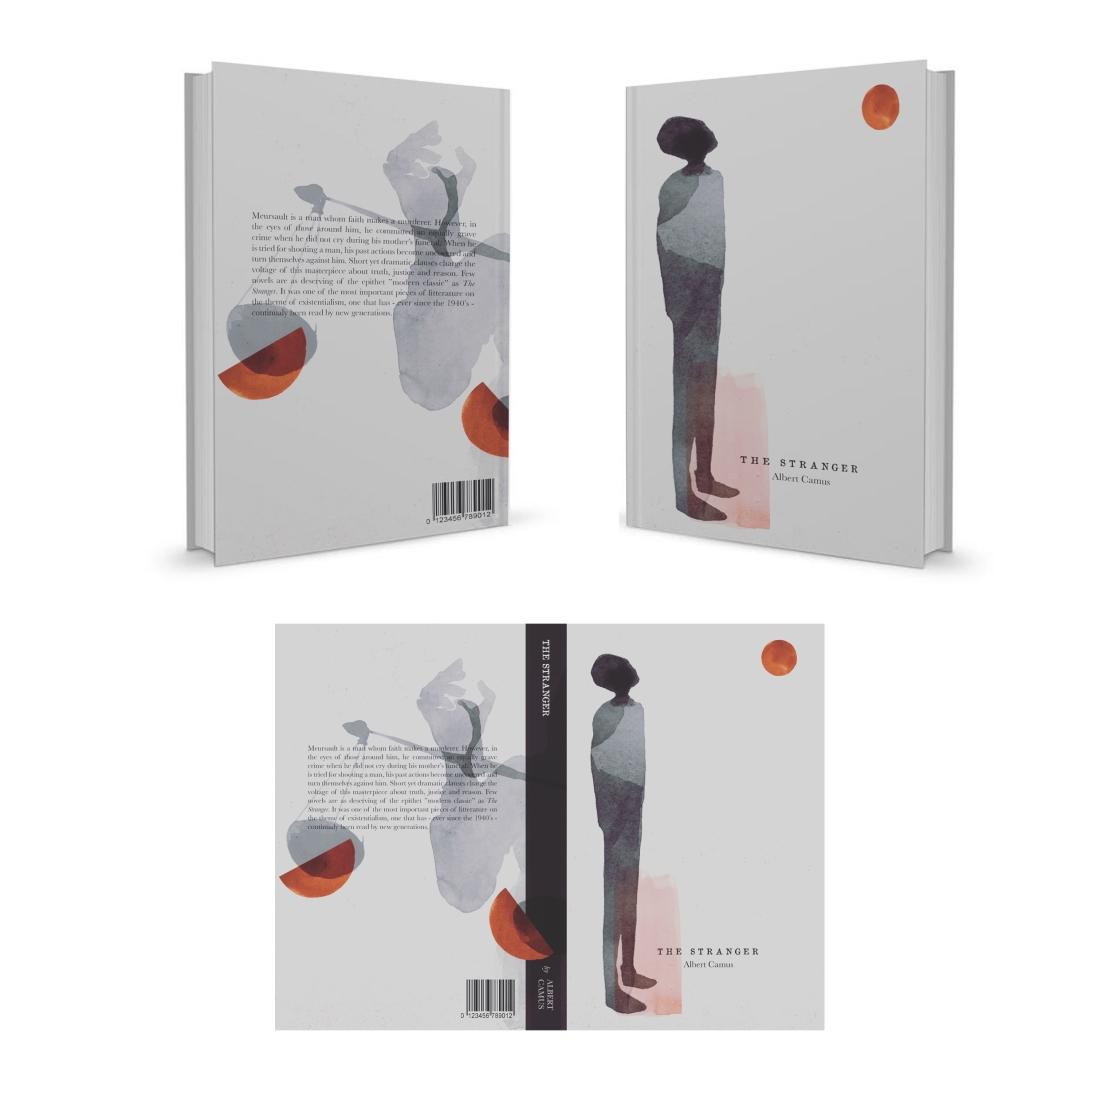 joannalayla_letranger_camus_bookpresentation